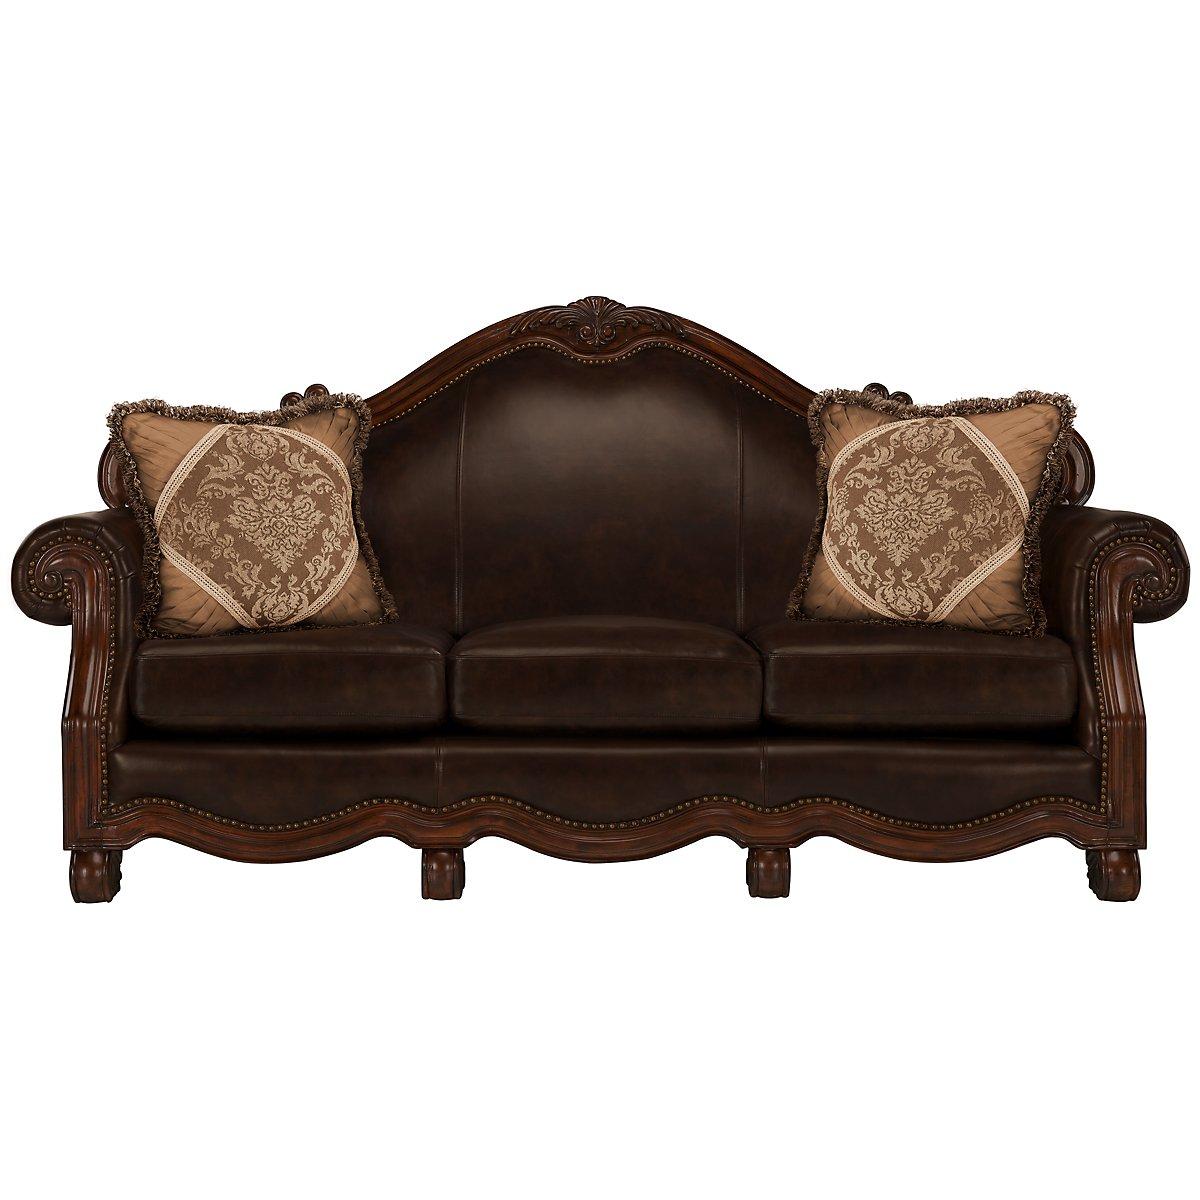 city furniture regal dark tone leather sofa. Black Bedroom Furniture Sets. Home Design Ideas